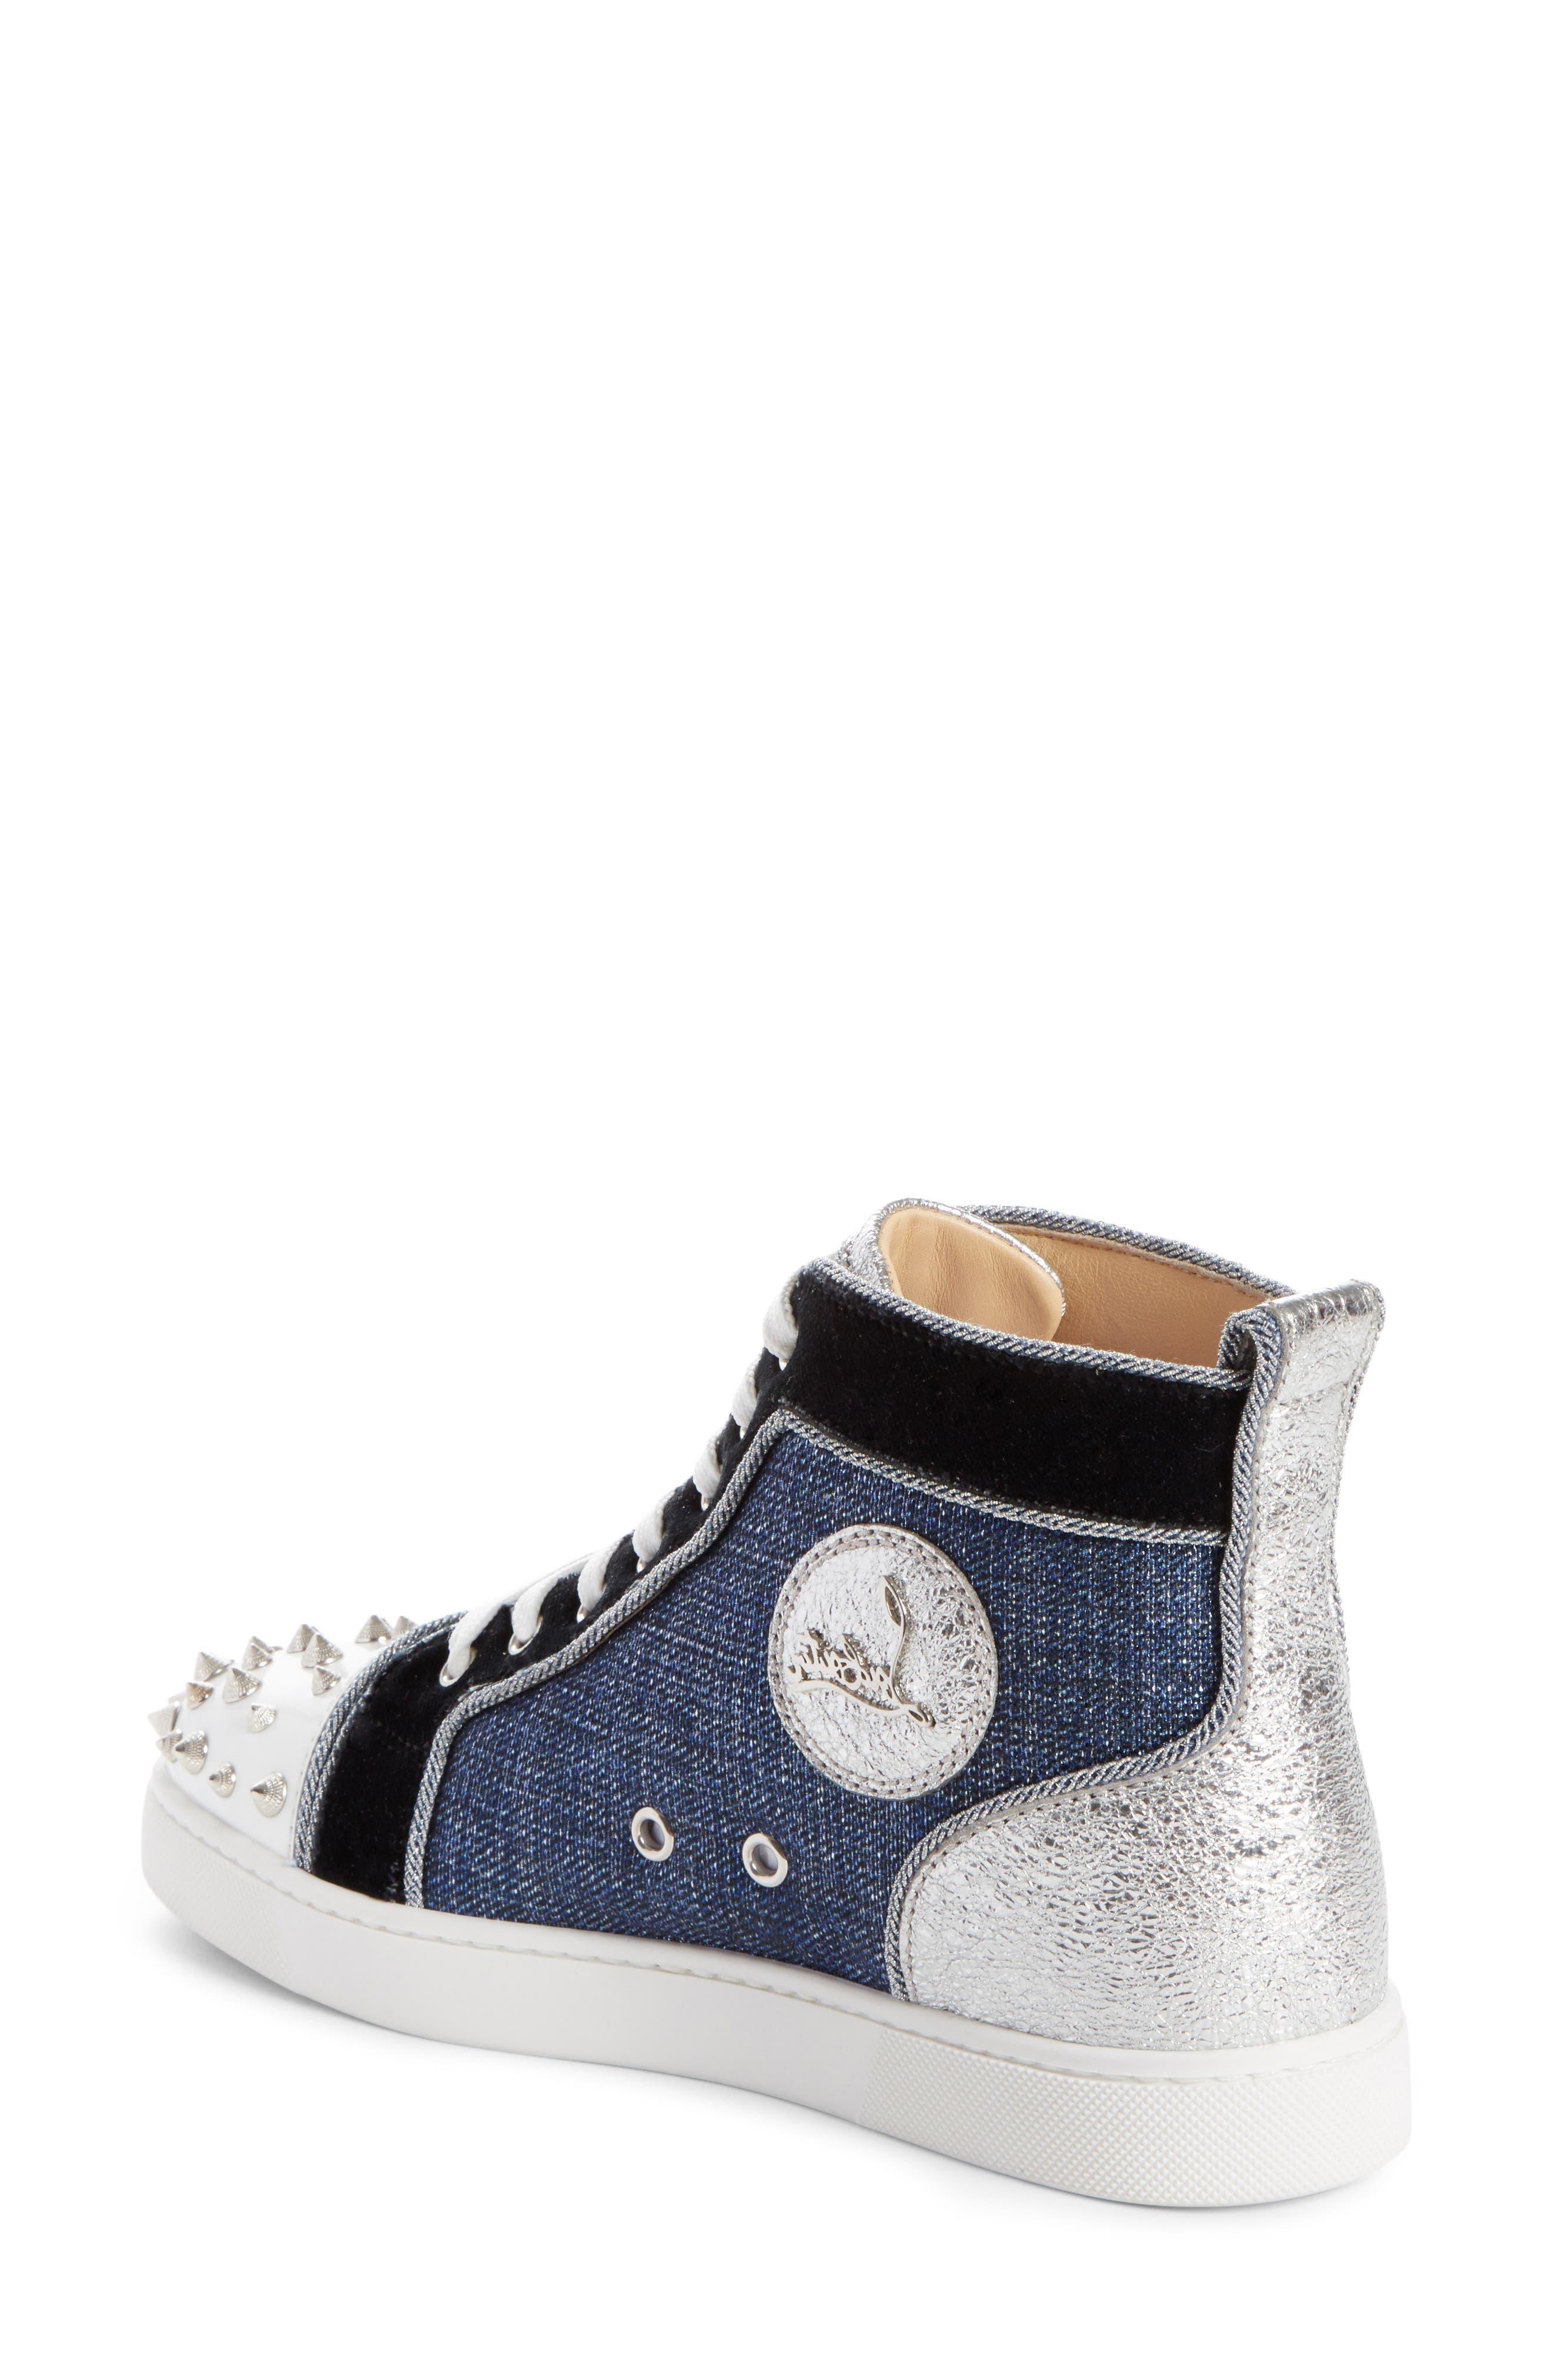 Lou Degra Spiked High Top Sneaker,                             Alternate thumbnail 2, color,                             Denim/ Silver